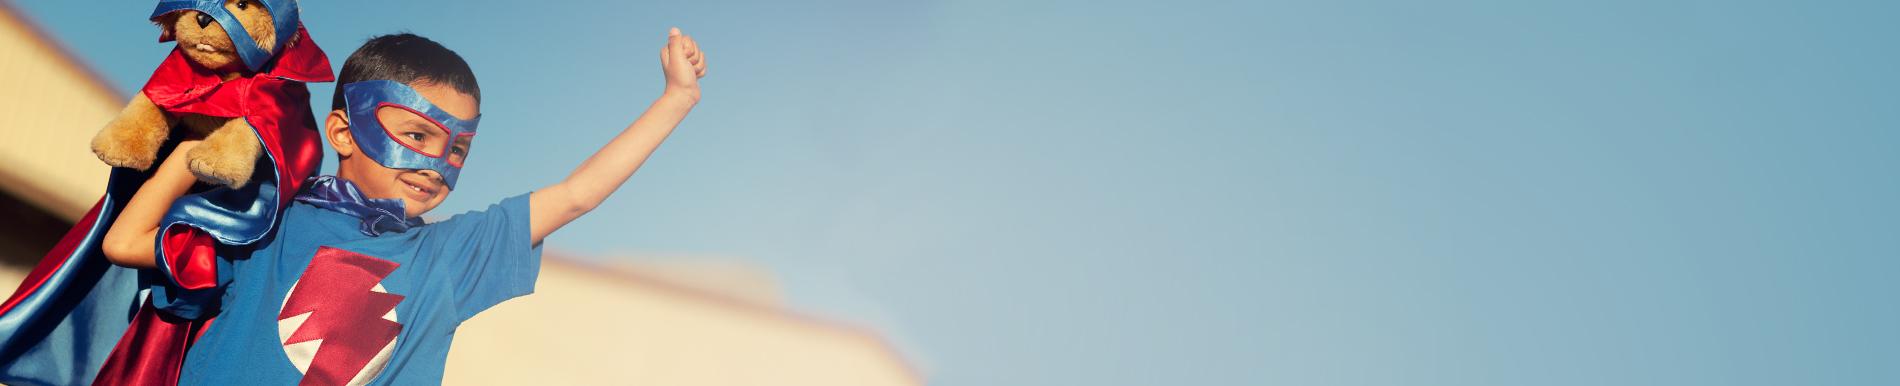 https://www.healthychildren.org/SiteCollectionImage-Homepage-Banners/lightning_boy_superhero.jpg